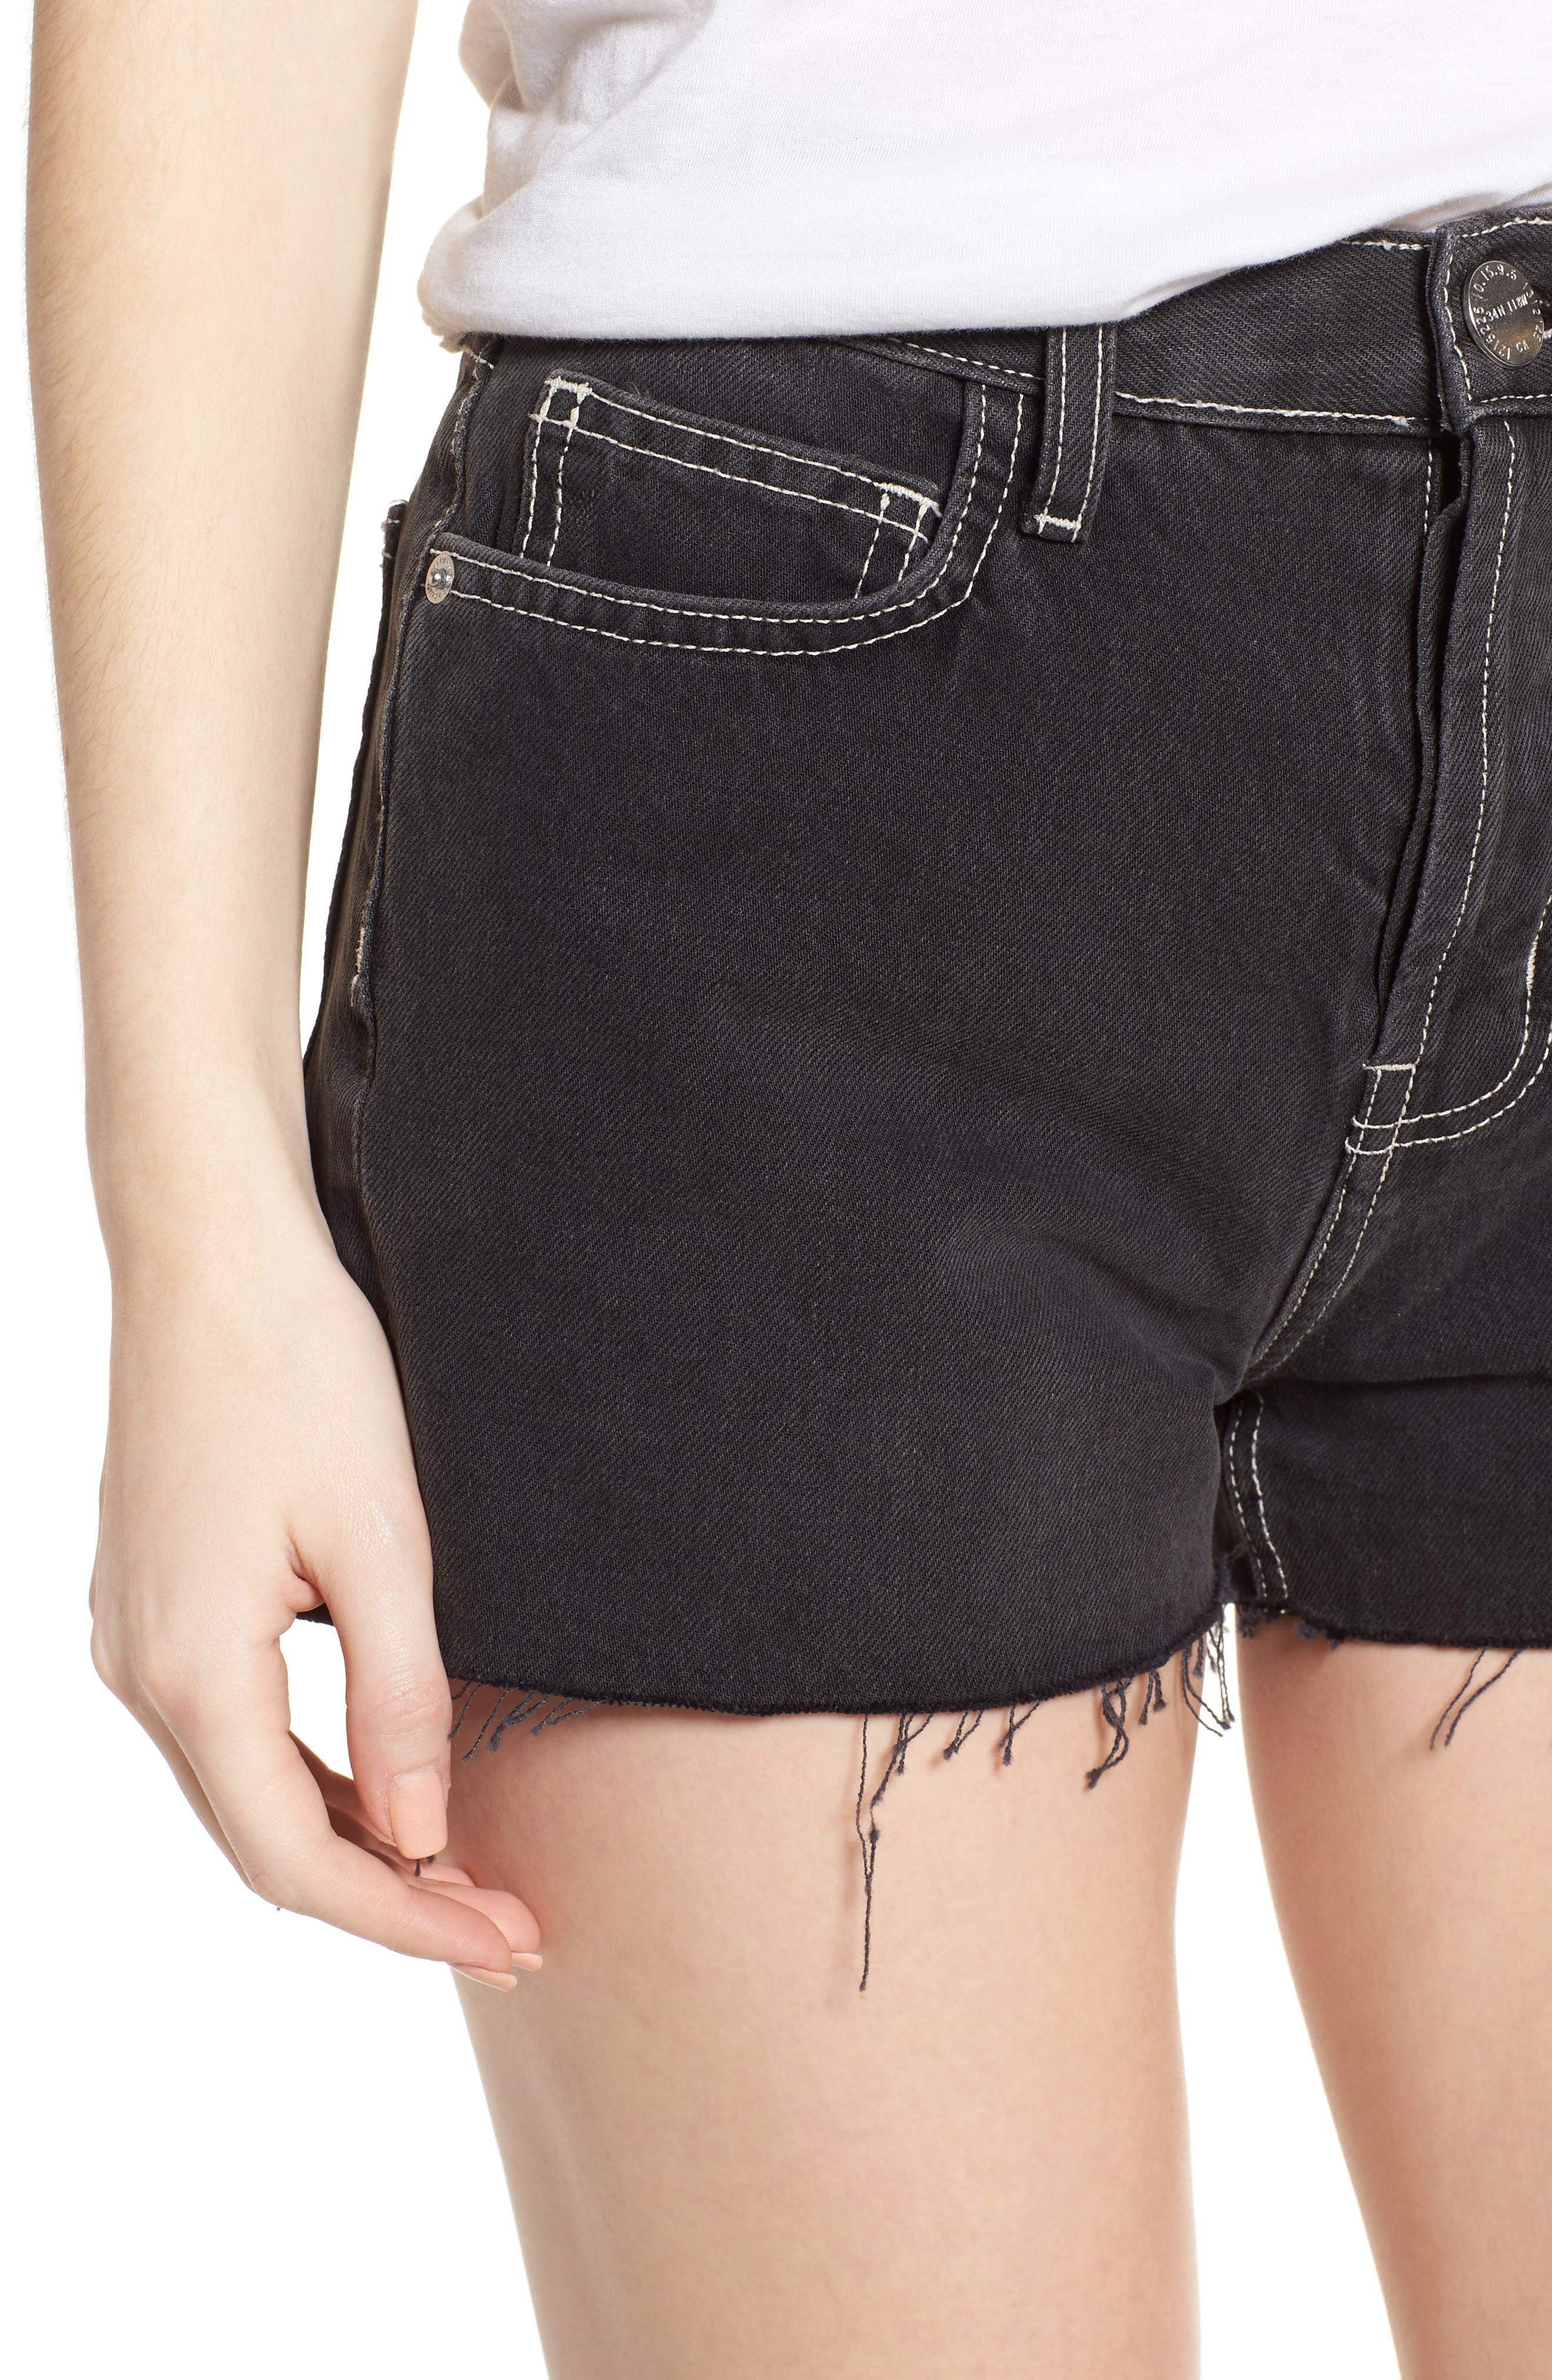 The Ultra High Waist Denim Shorts,                             Alternate thumbnail 4, color,                             006